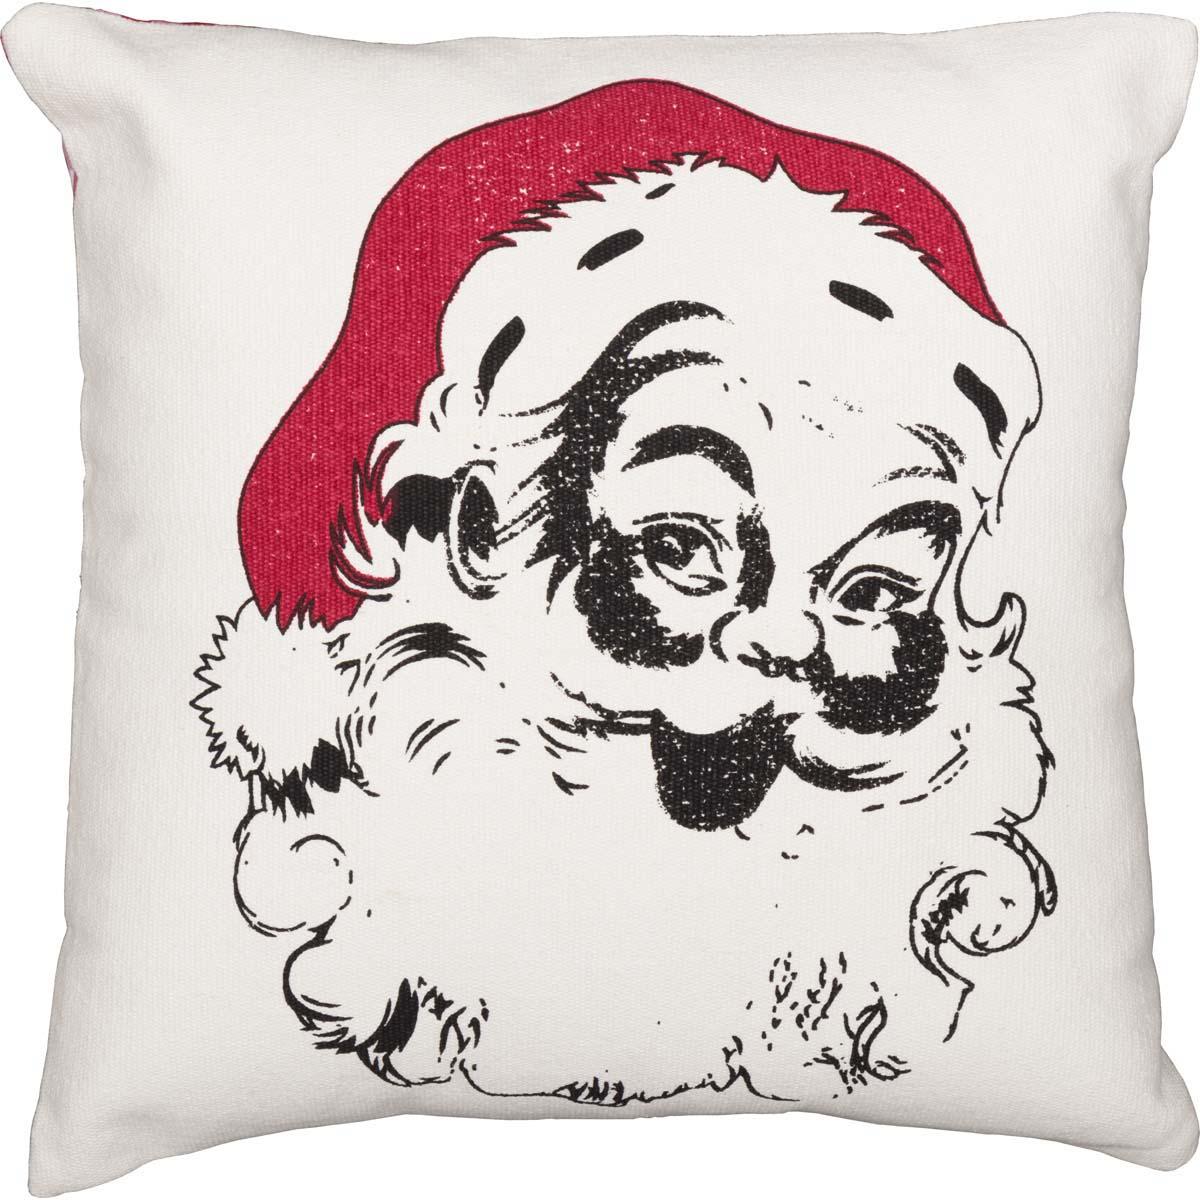 Emmie Vintage Santa Pillow 18x18